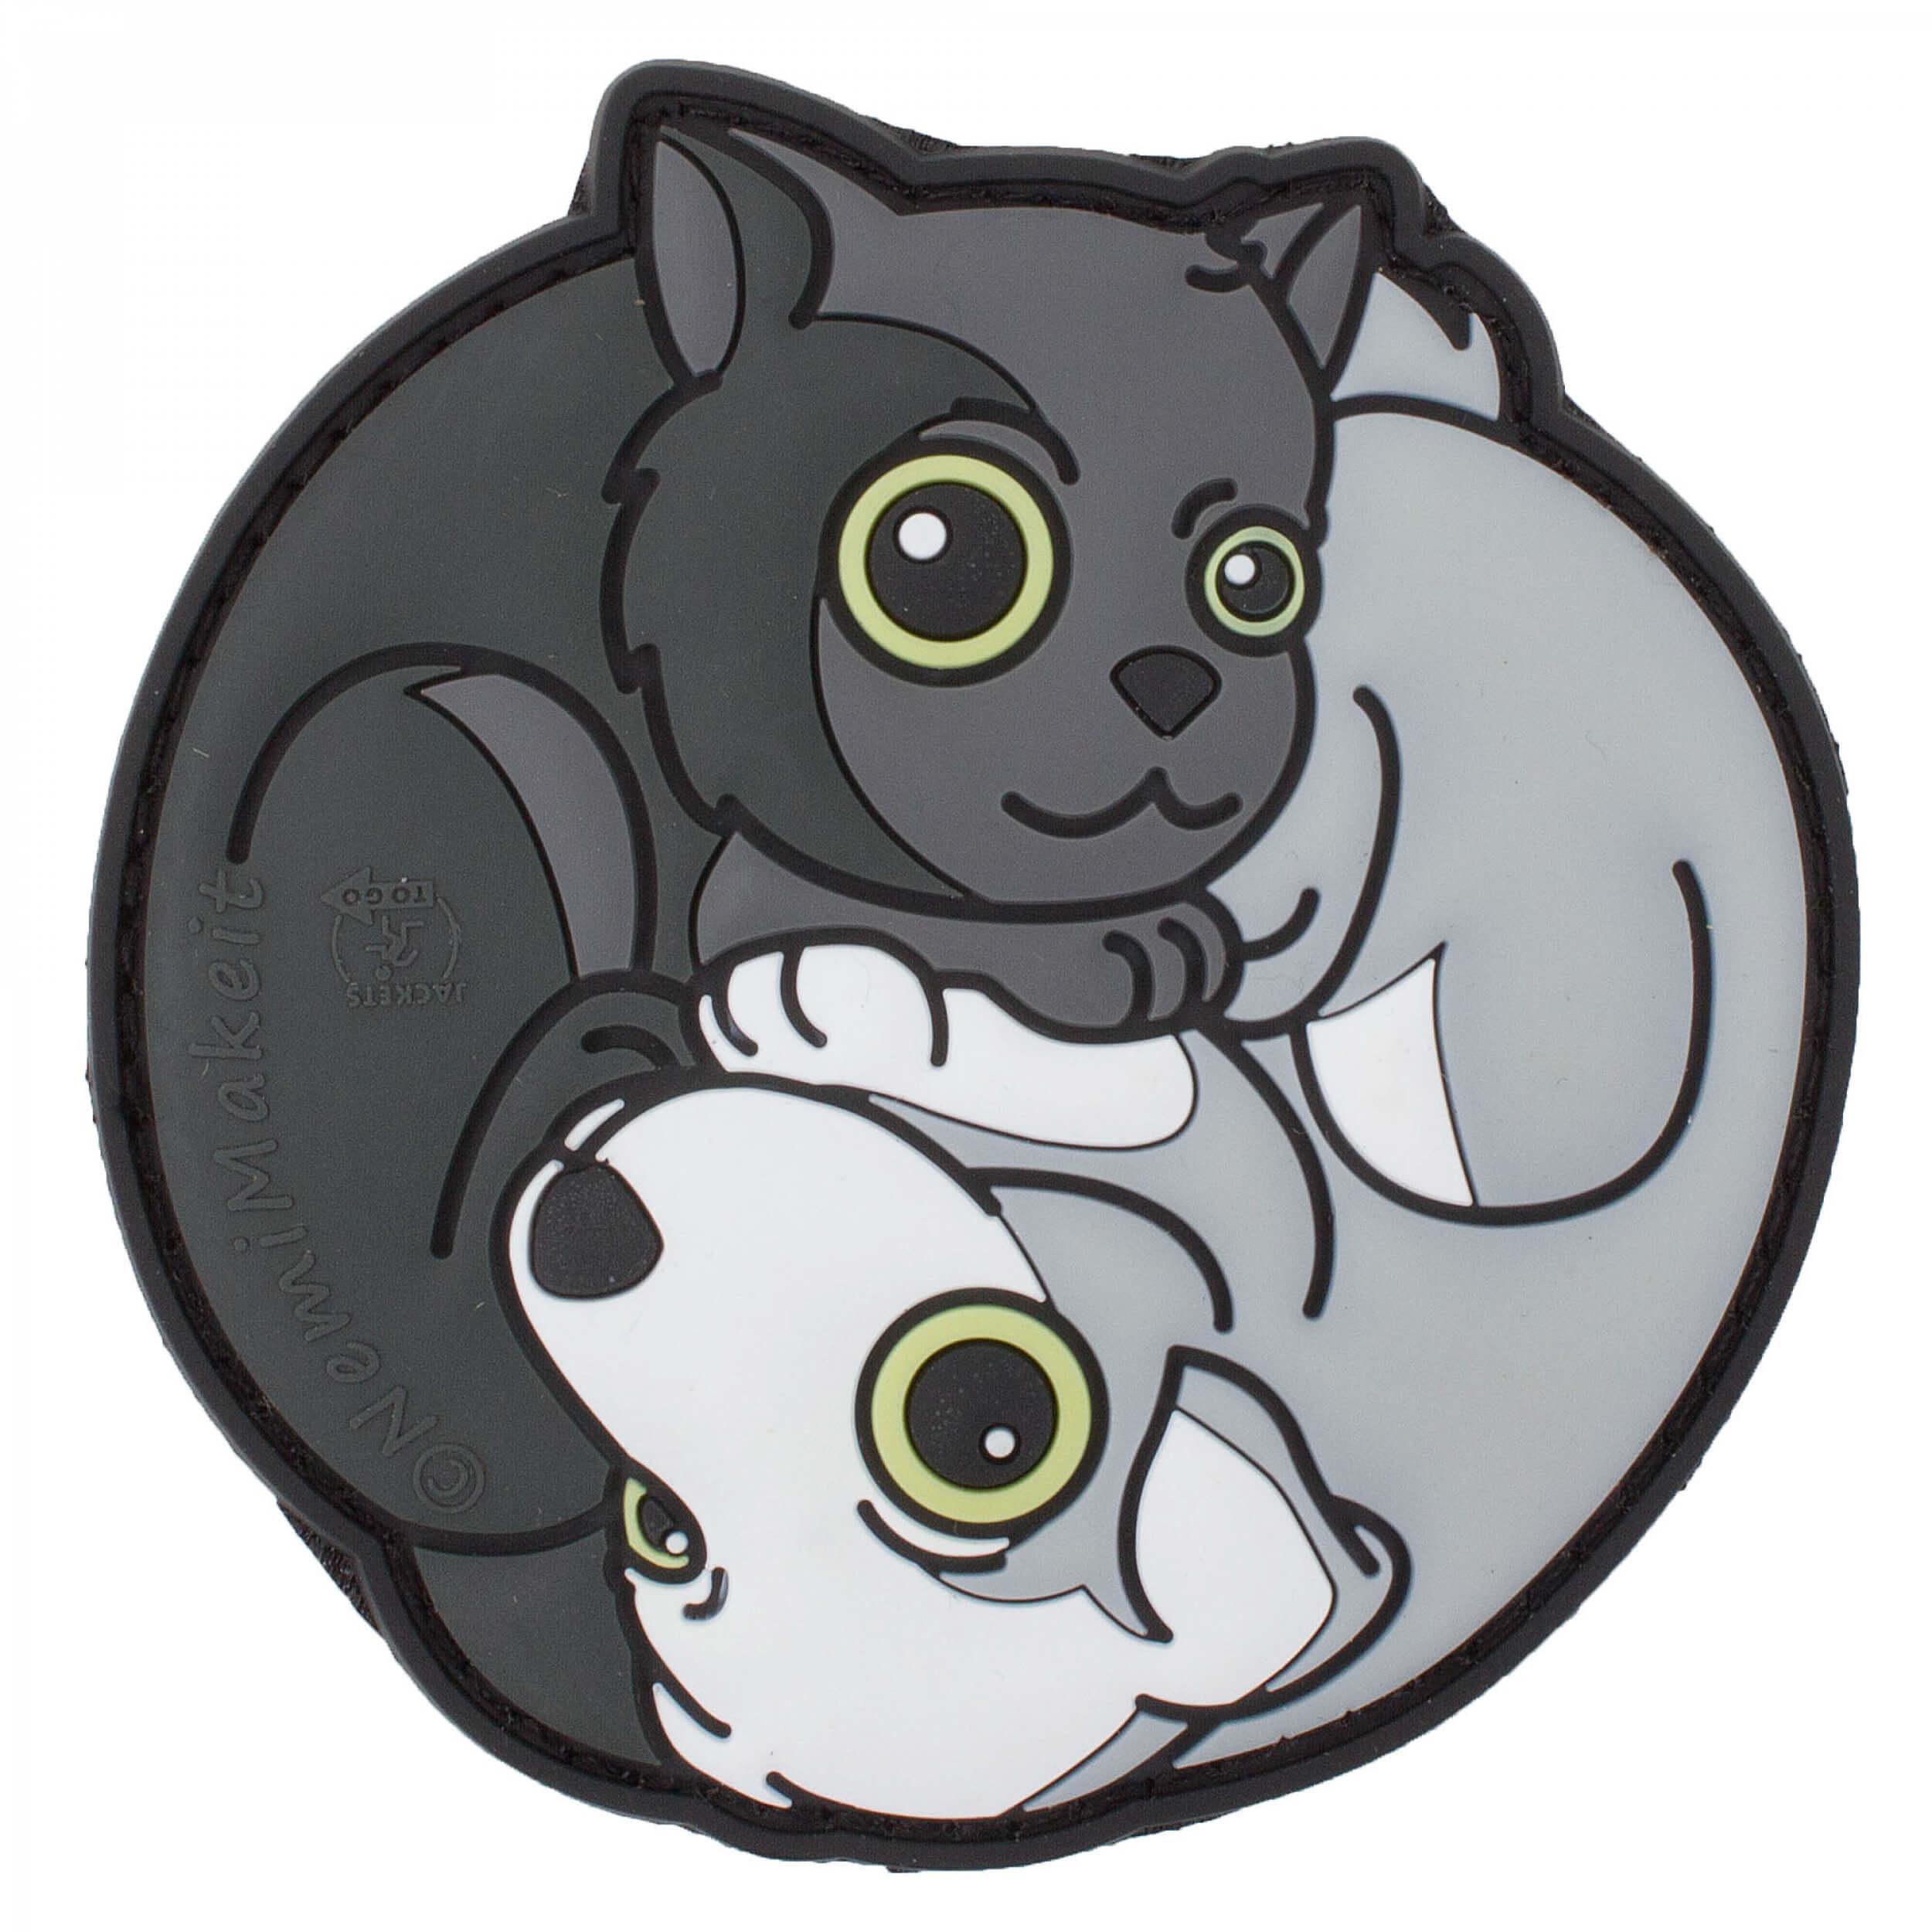 Black Cat - White Dog Yin & Yan 3D Rubber Patch, fullcolor